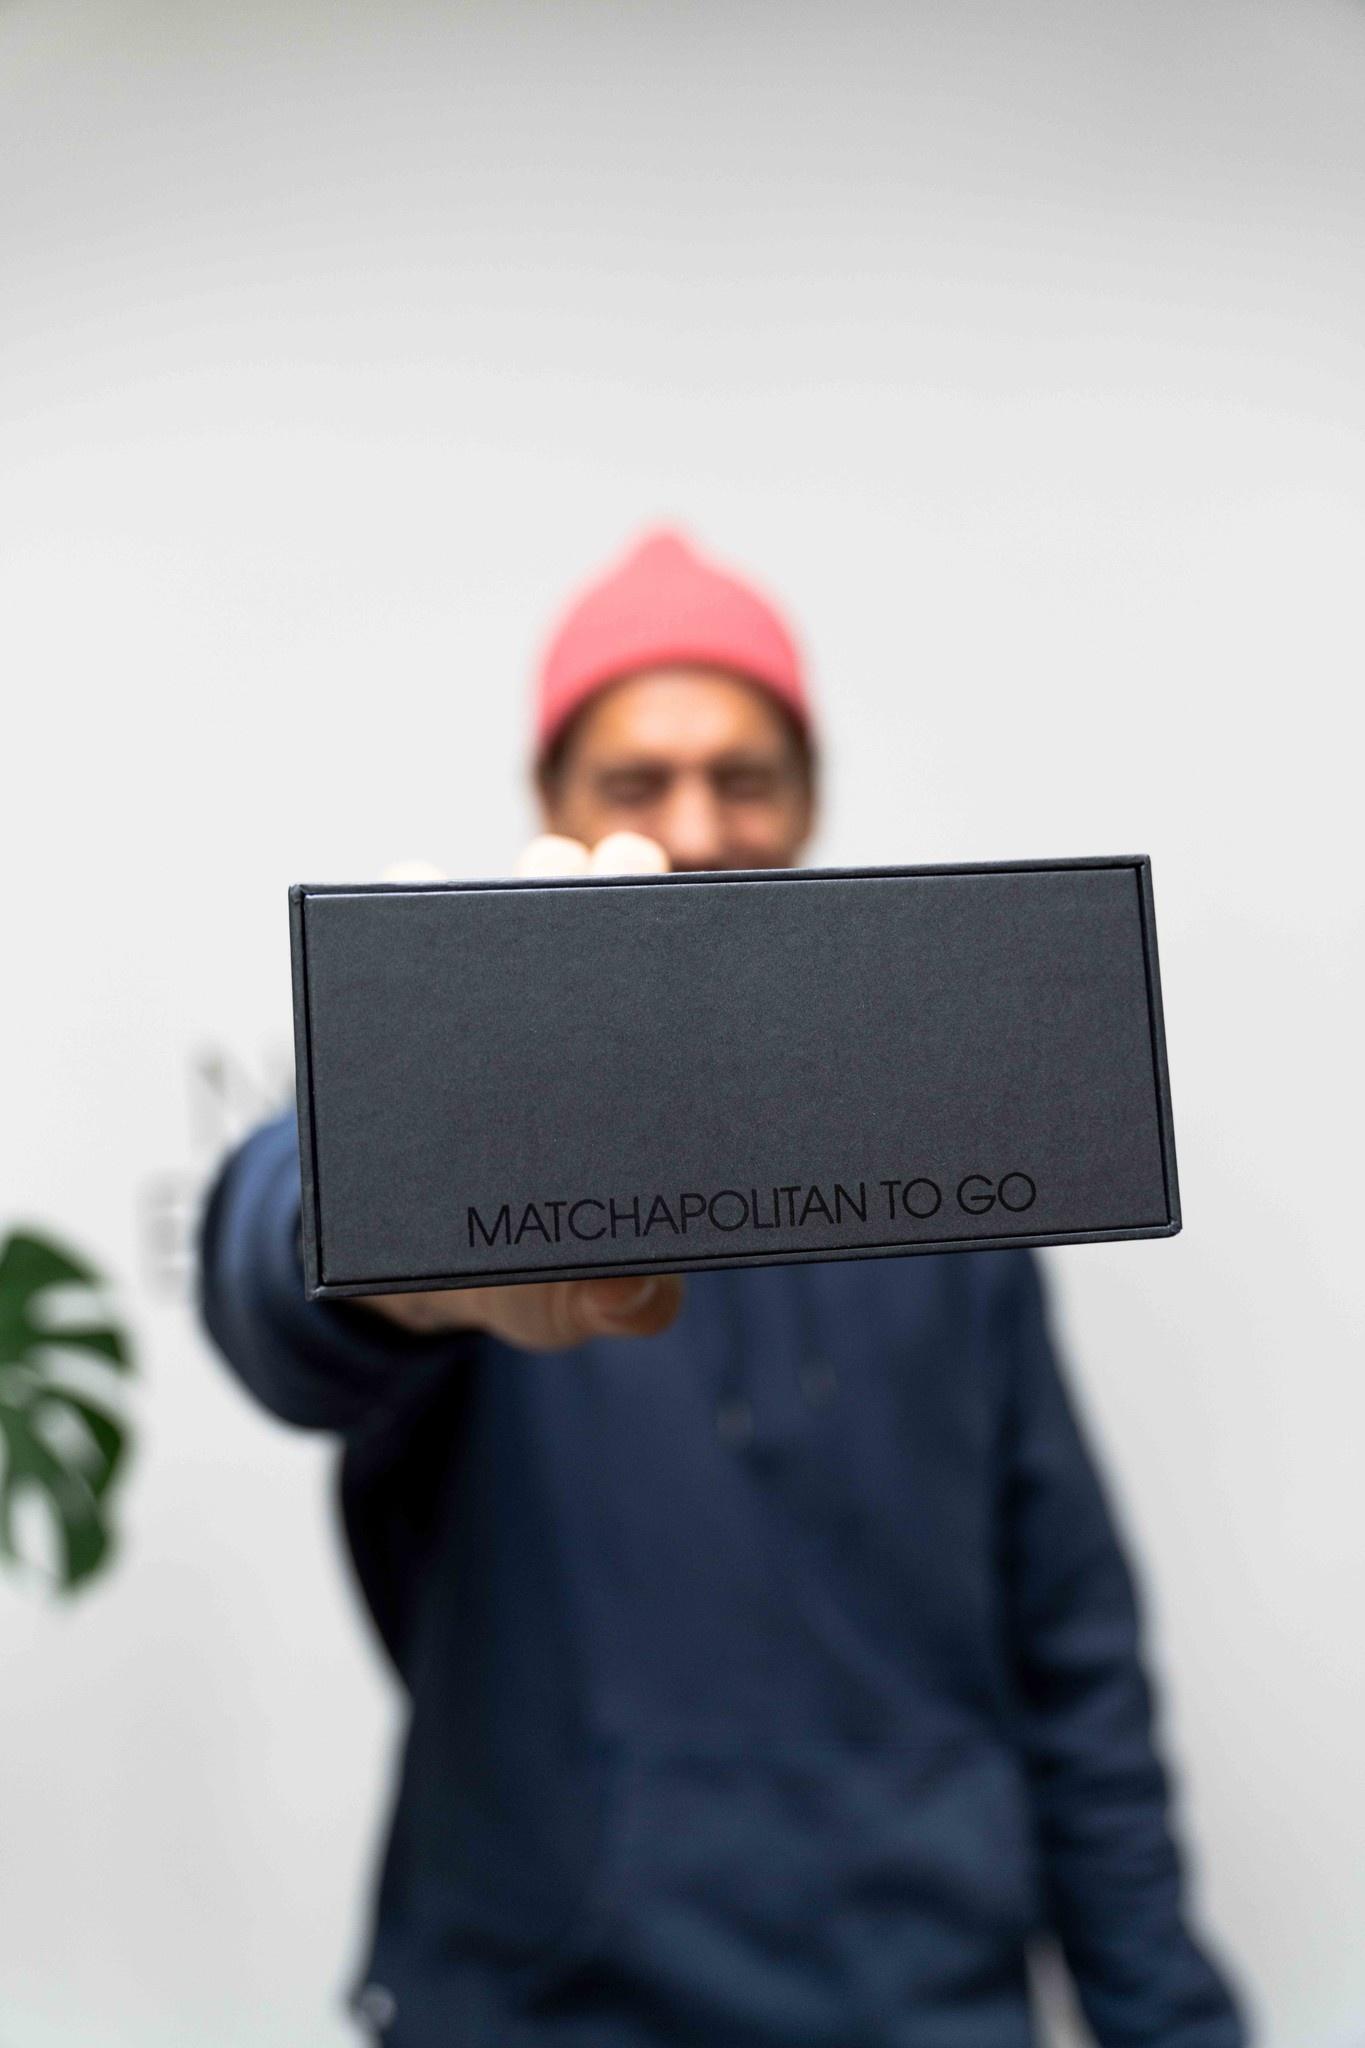 Matchapolitan to go (box)